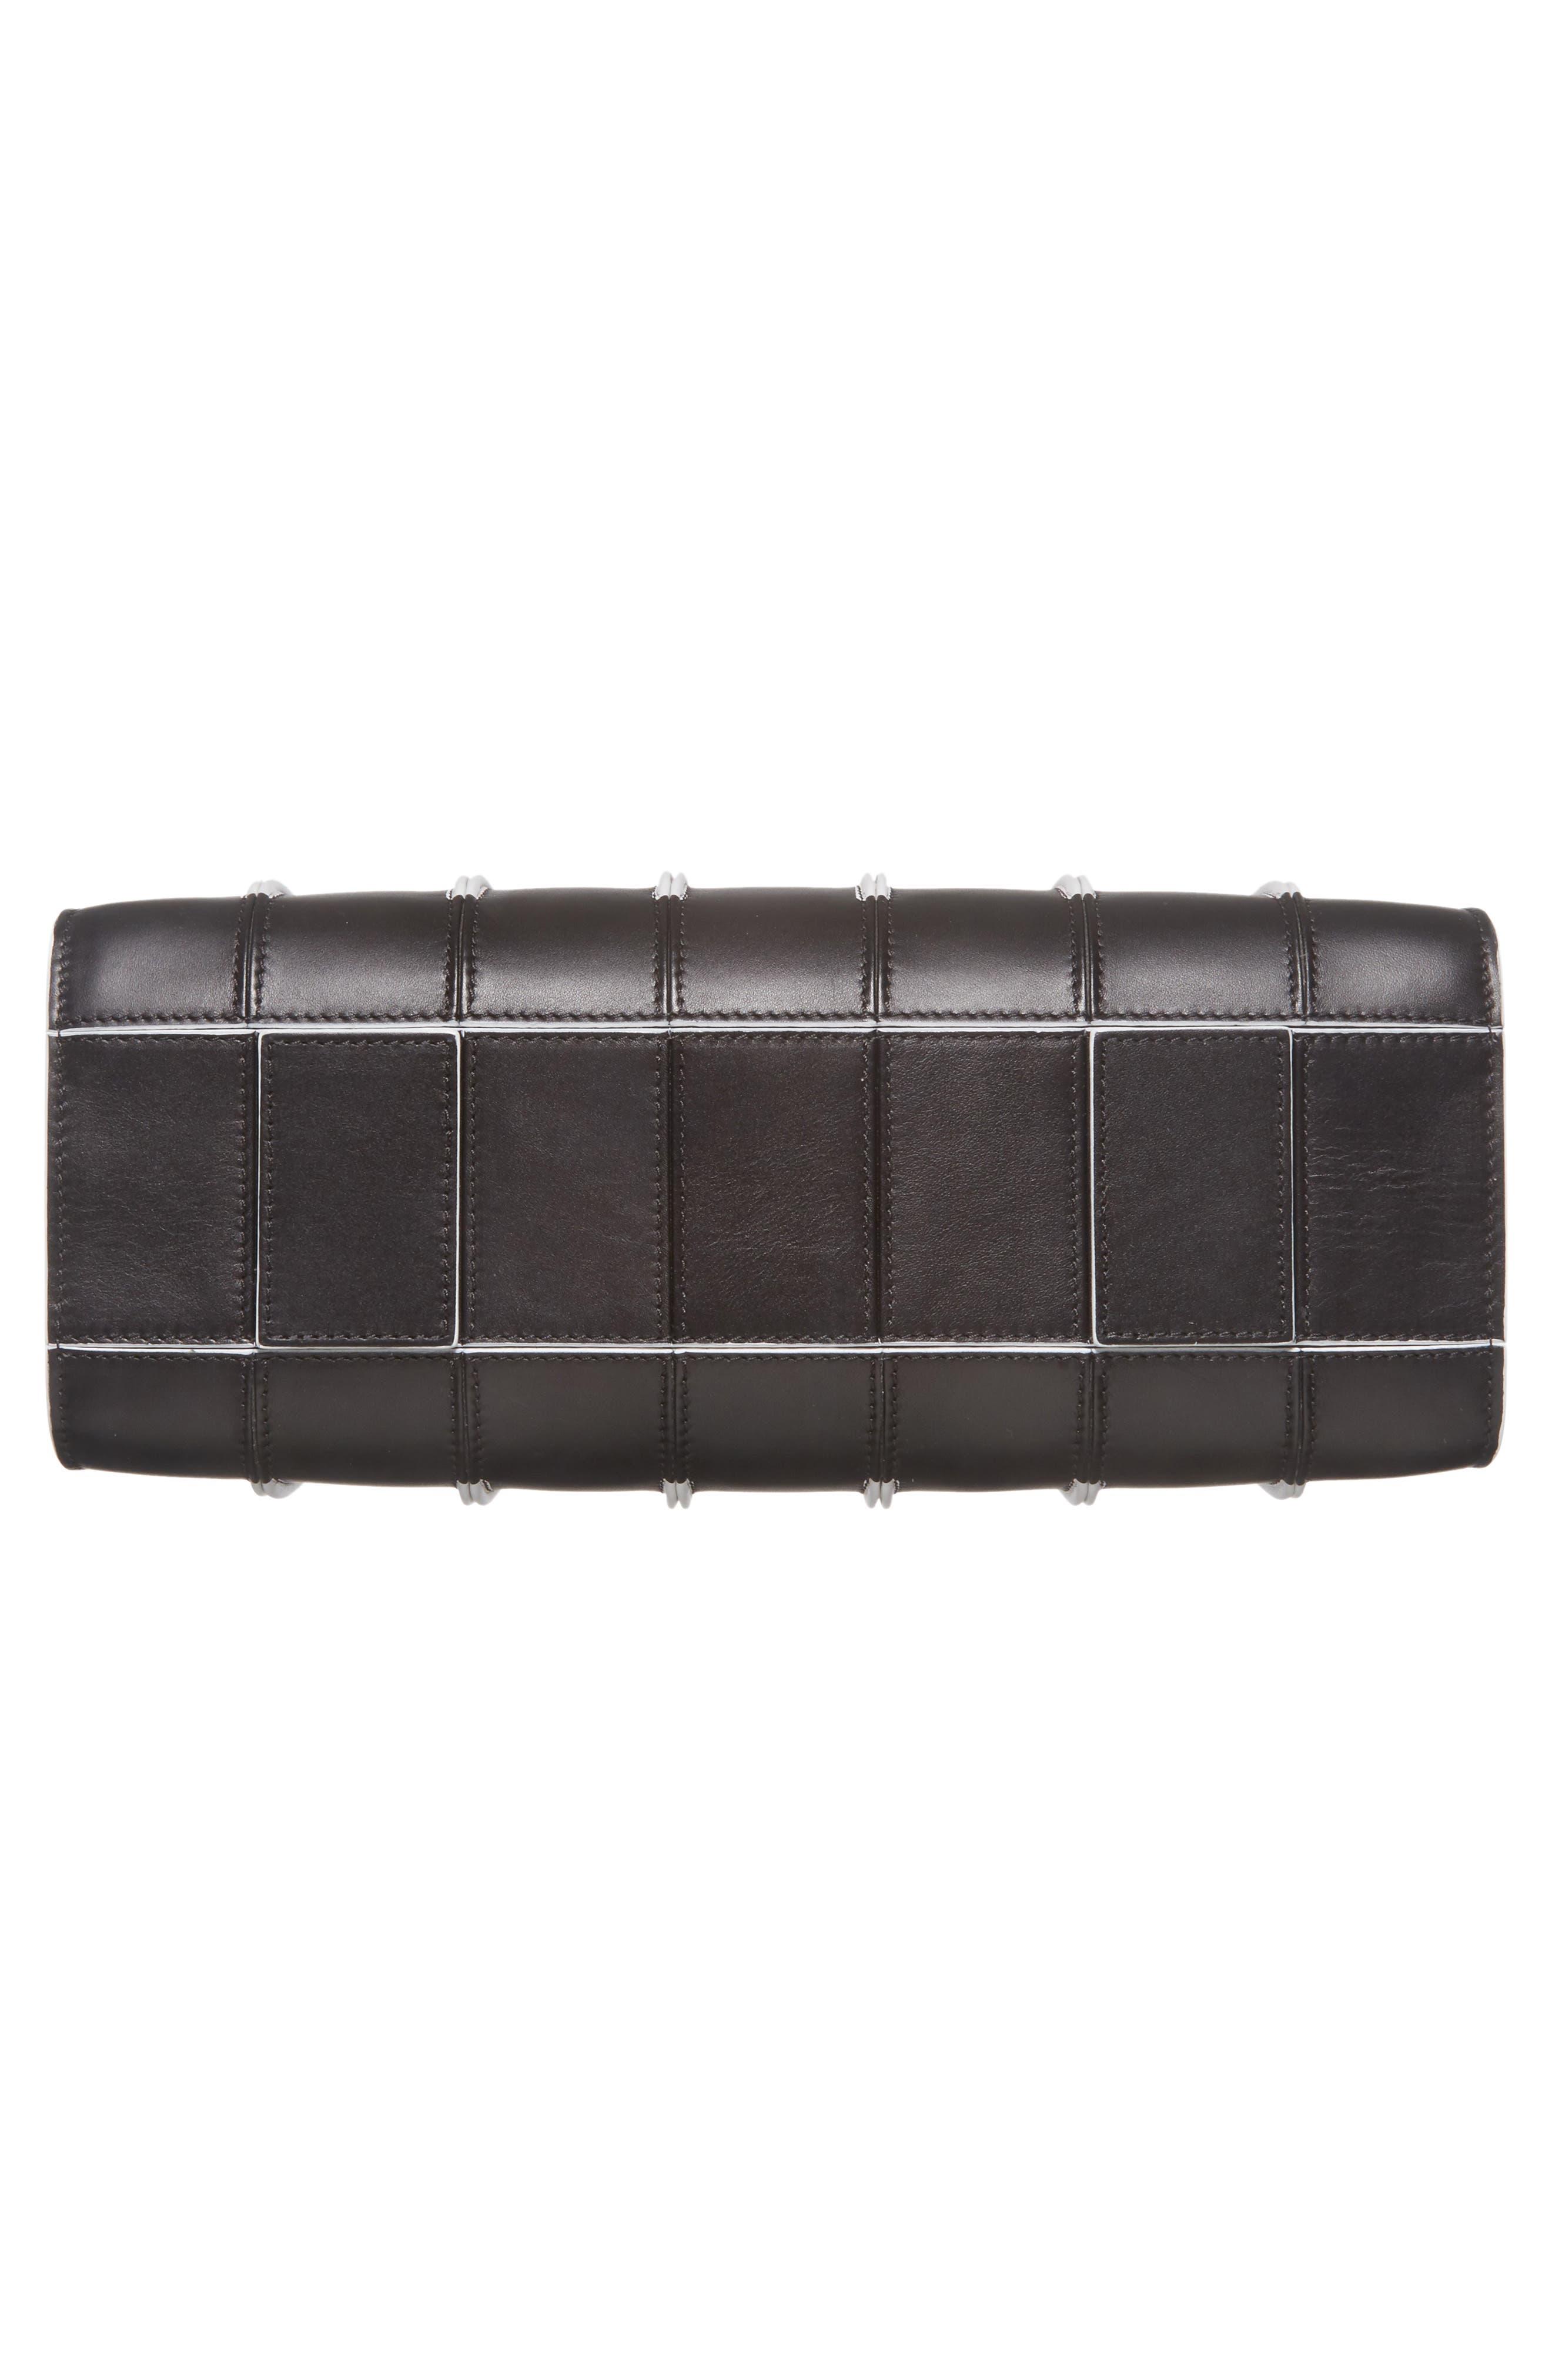 Medium Whitney Leather Tote,                             Alternate thumbnail 6, color,                             001